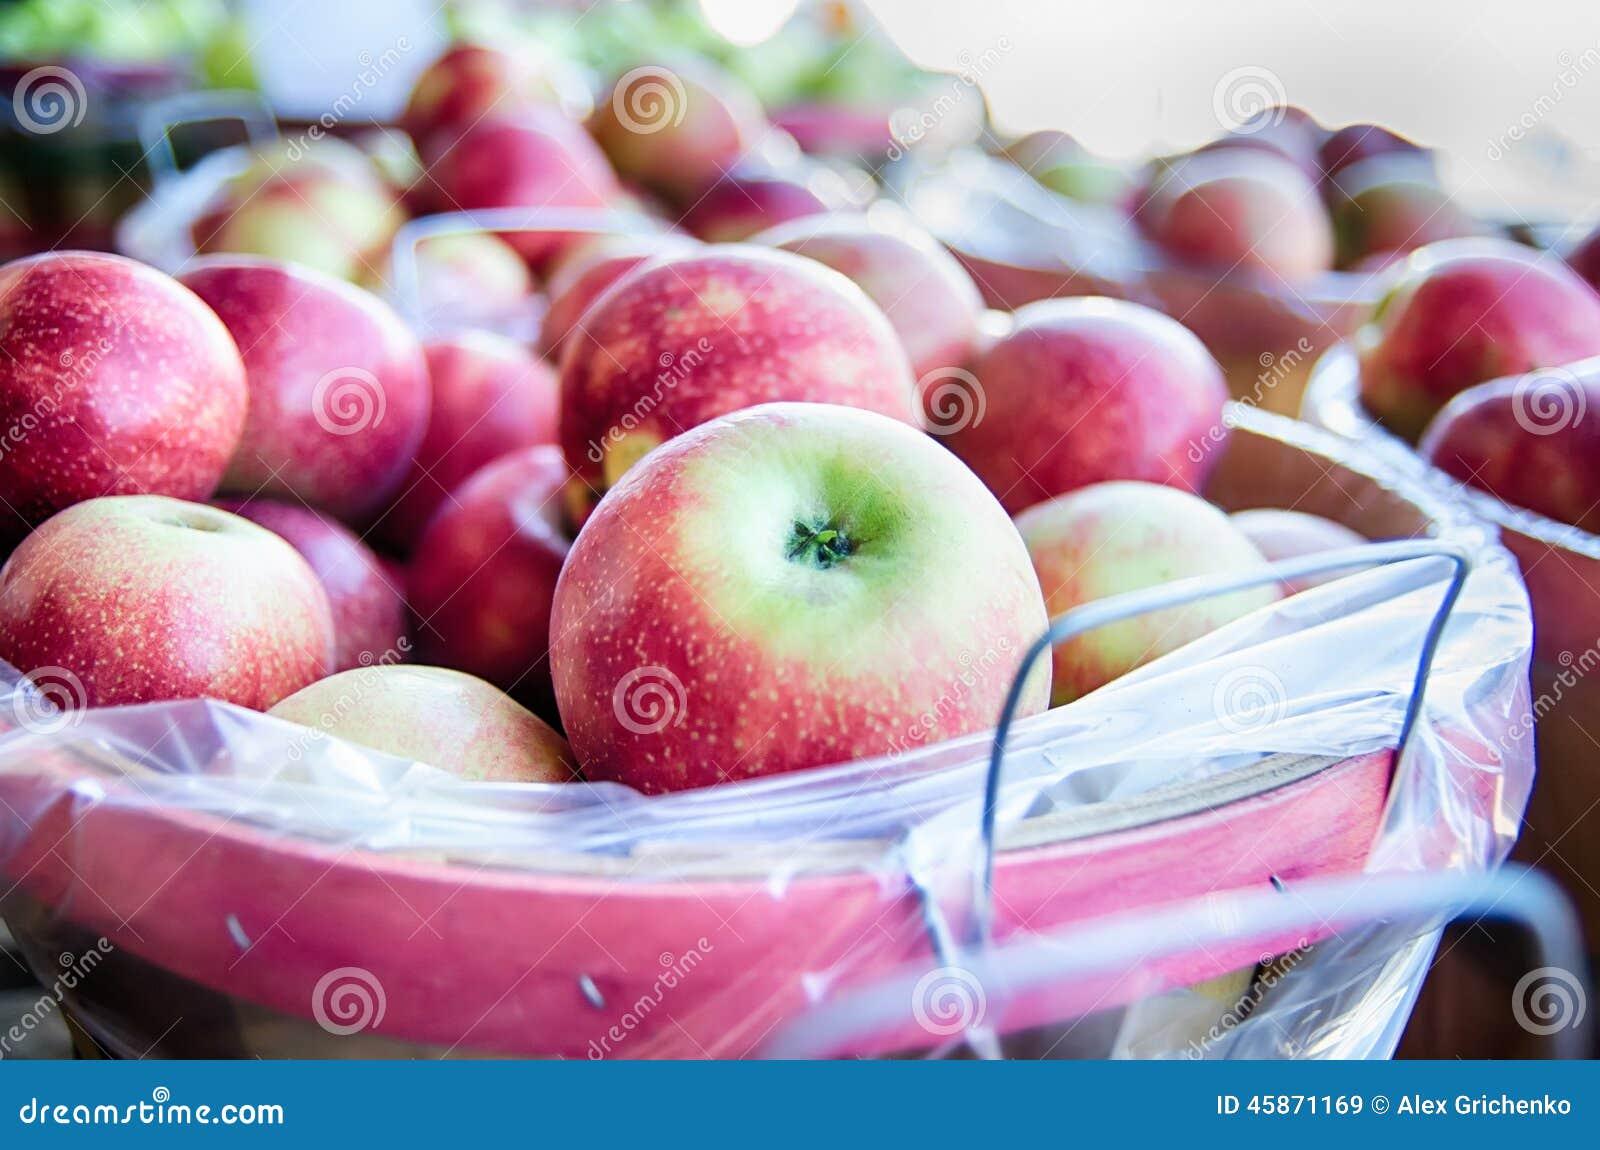 Large Bushel Basket Full Of Fresh Locally Grown Red Apples ...